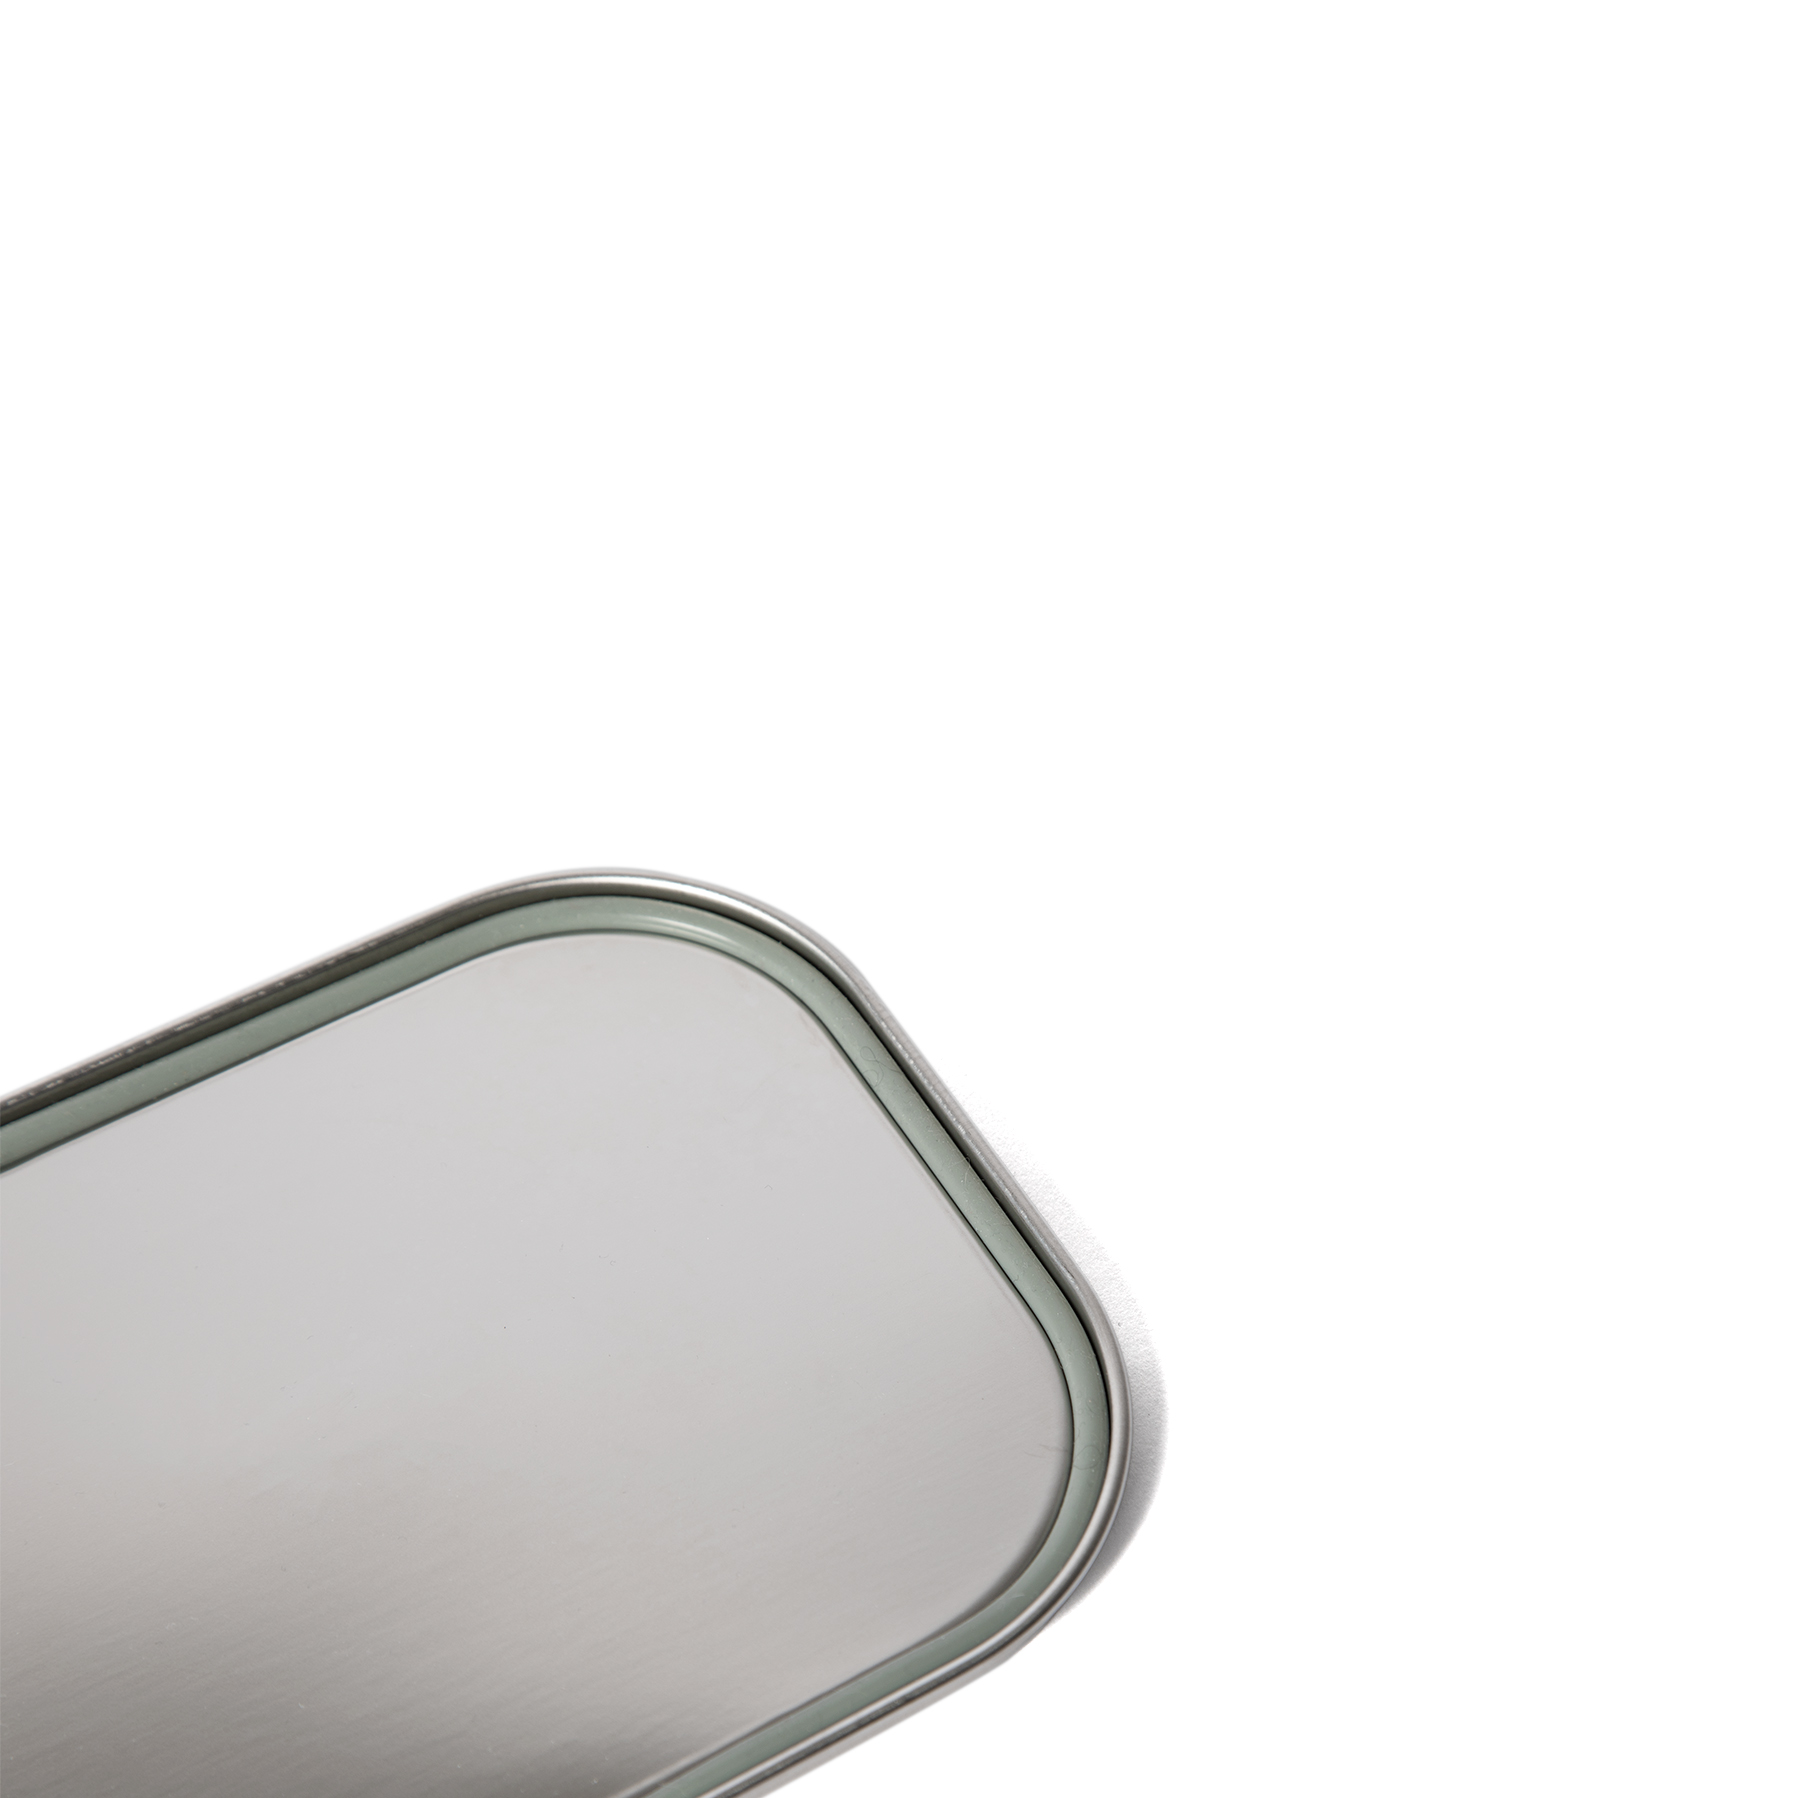 Bento Classic +, auslaufsicher, aus Edelstahl, EcoBrotbox